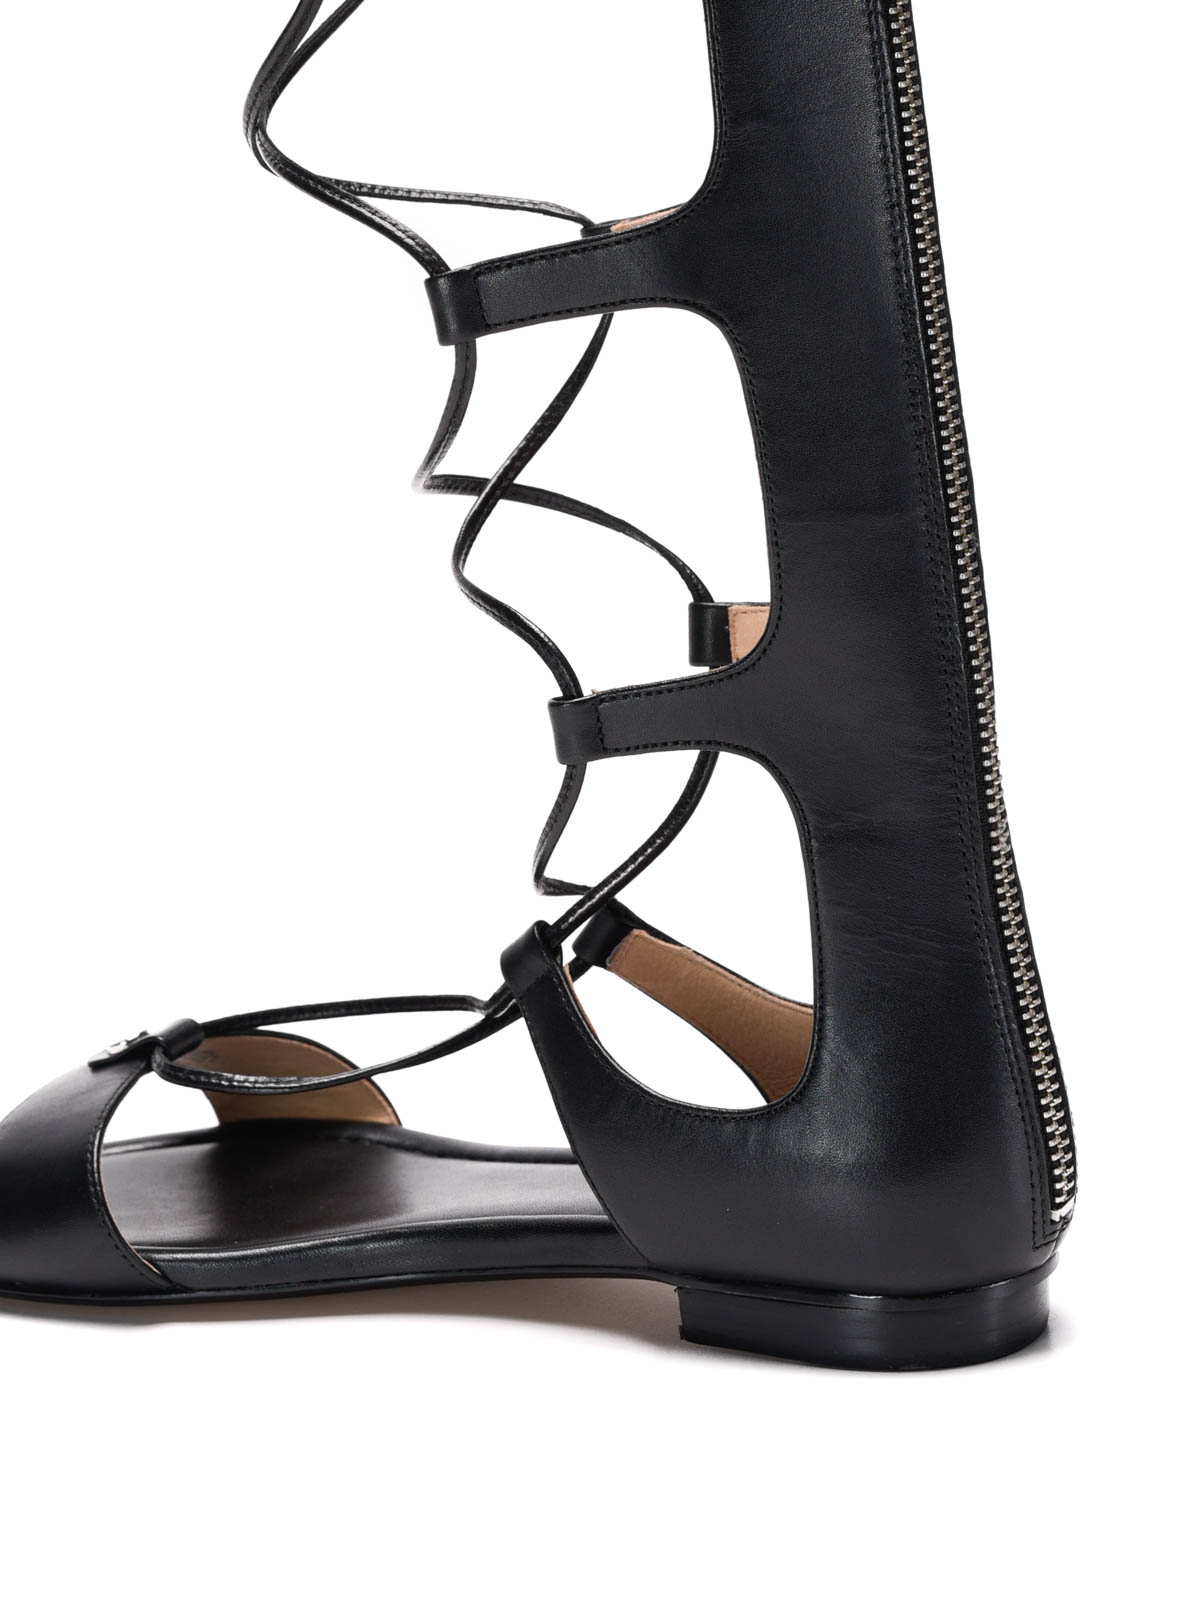 f012c57a993 Michael Kors - Sofia gladiator sandals - sandals - 40S6SFFA3L ...